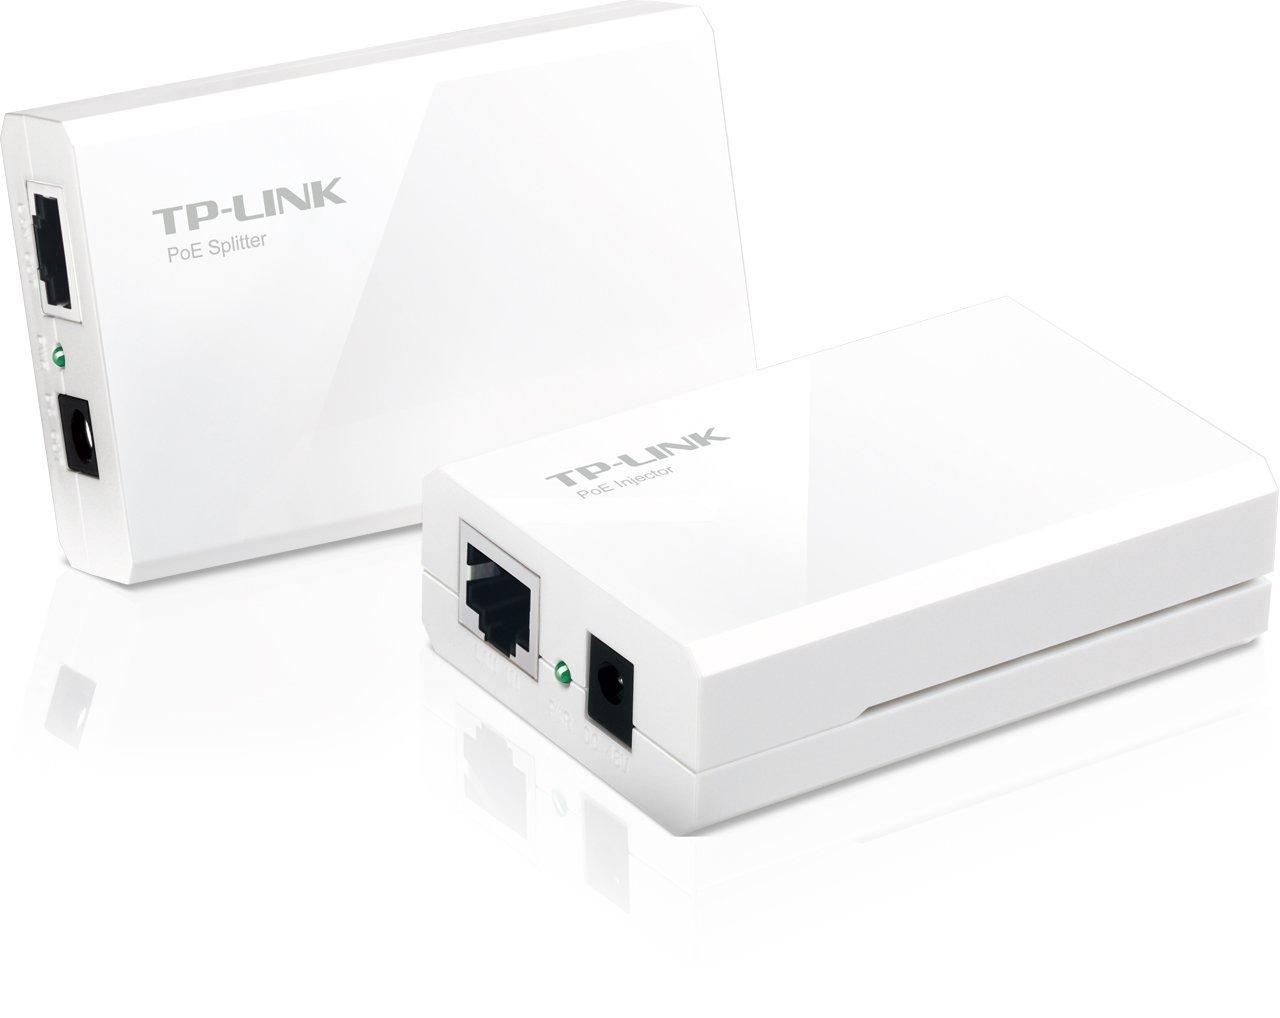 TP-LINK DOCSIS 3 0 Cable Modem TC-7610 Price in Pakistan